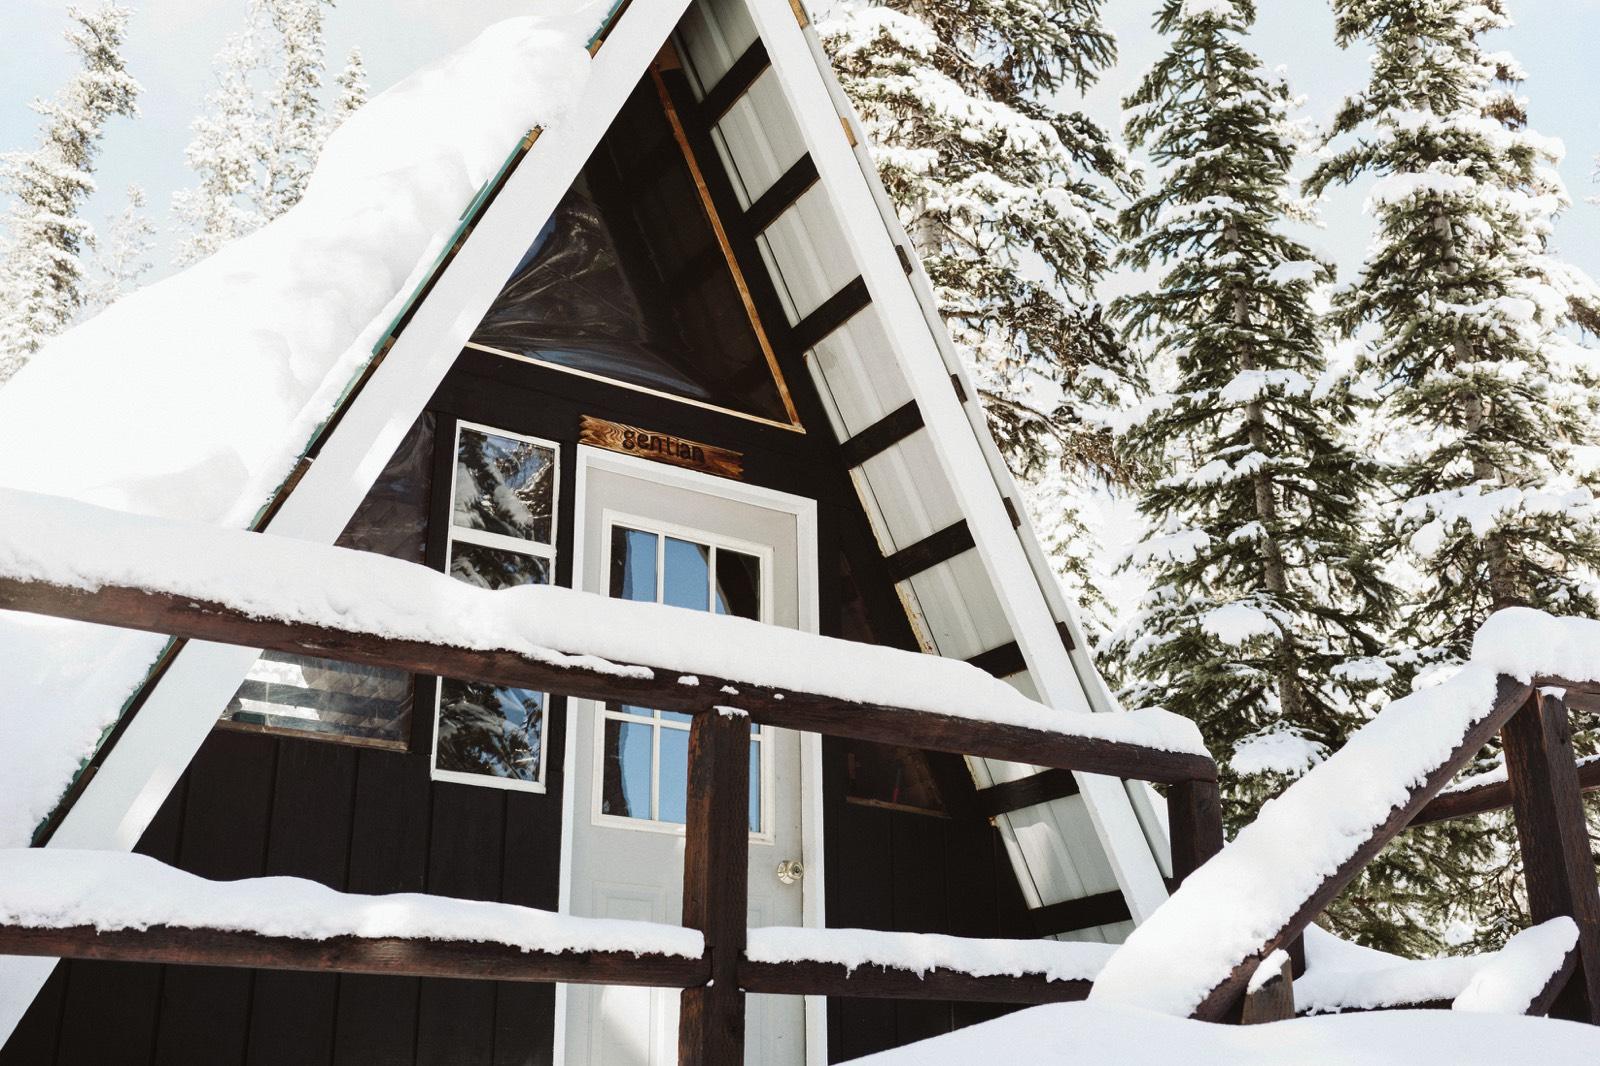 alpine-lakes-high-camp-winter-wedding-13 ALPINE LAKES HIGH CAMP WEDDING